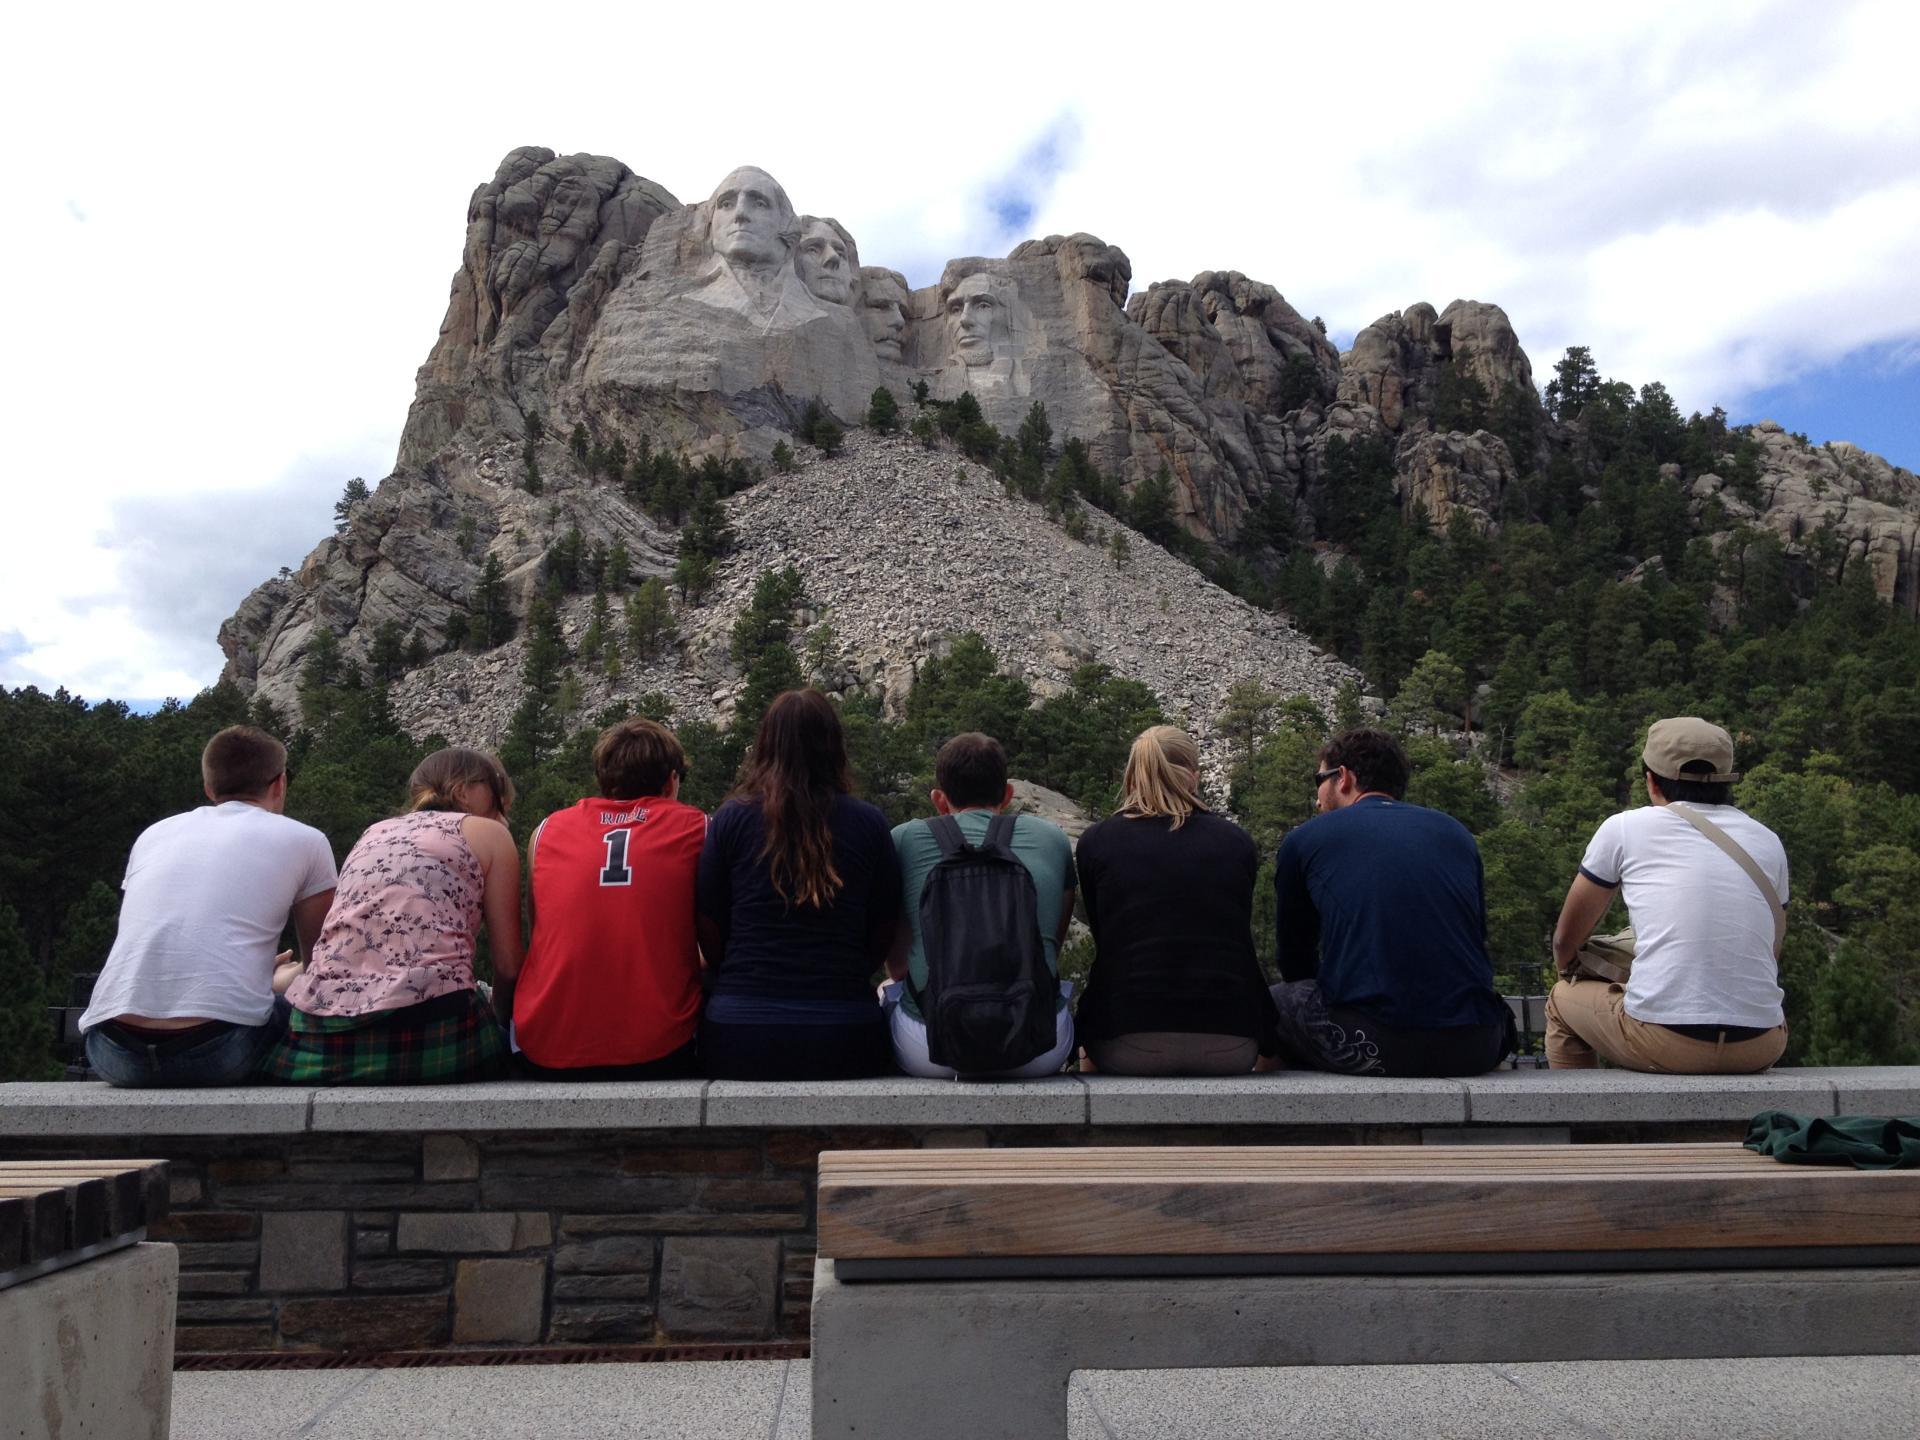 Trek America Mount Rushmore